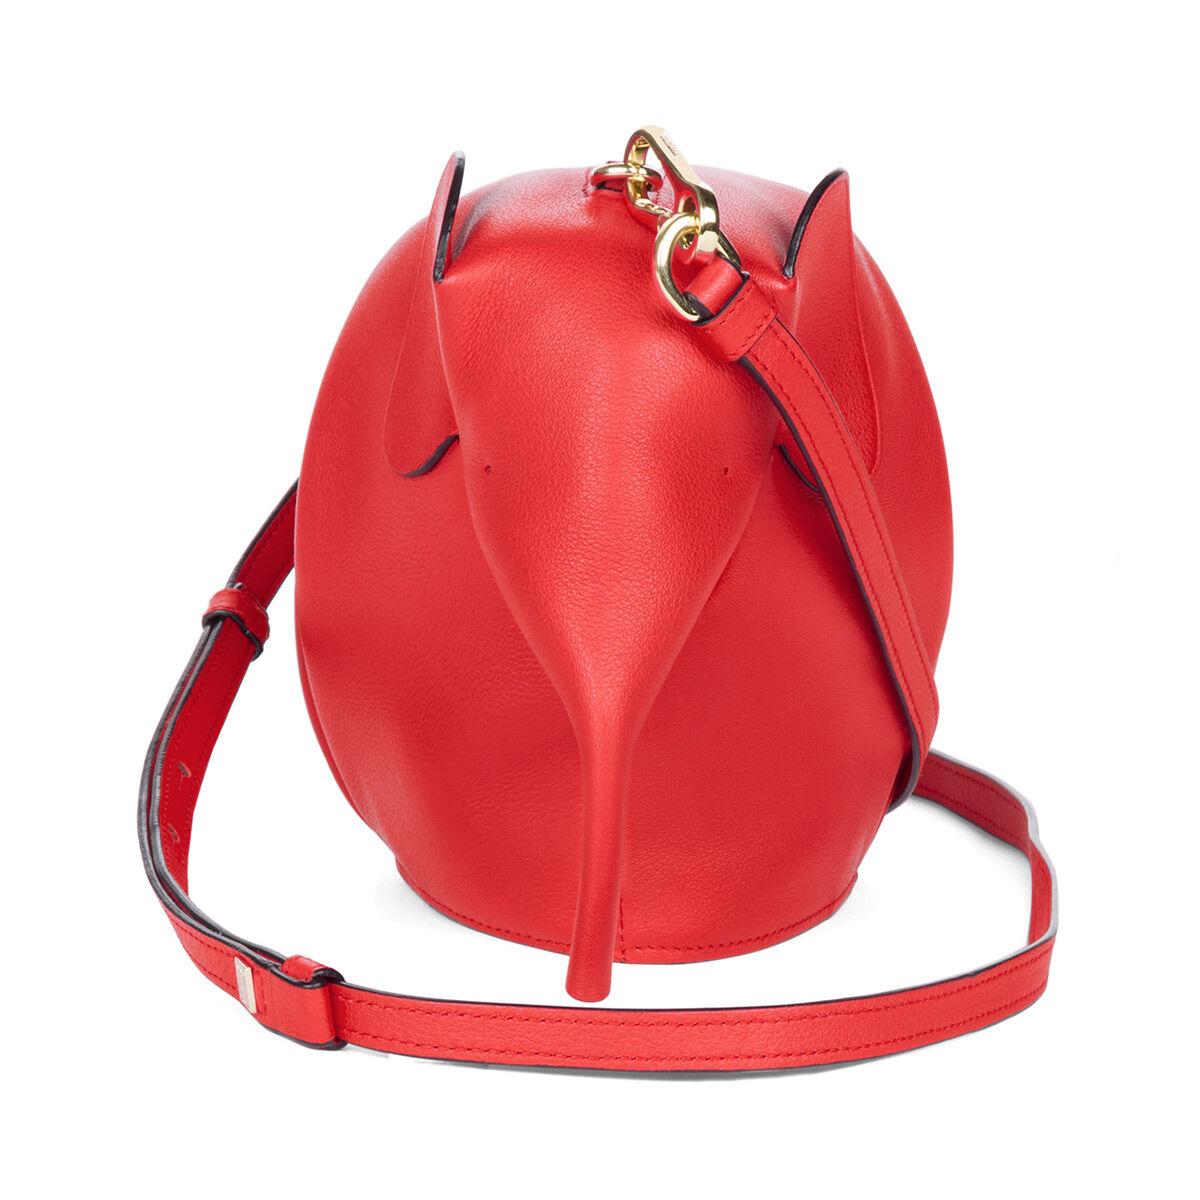 LOEWE Mini Bolso Elefante Rojo all